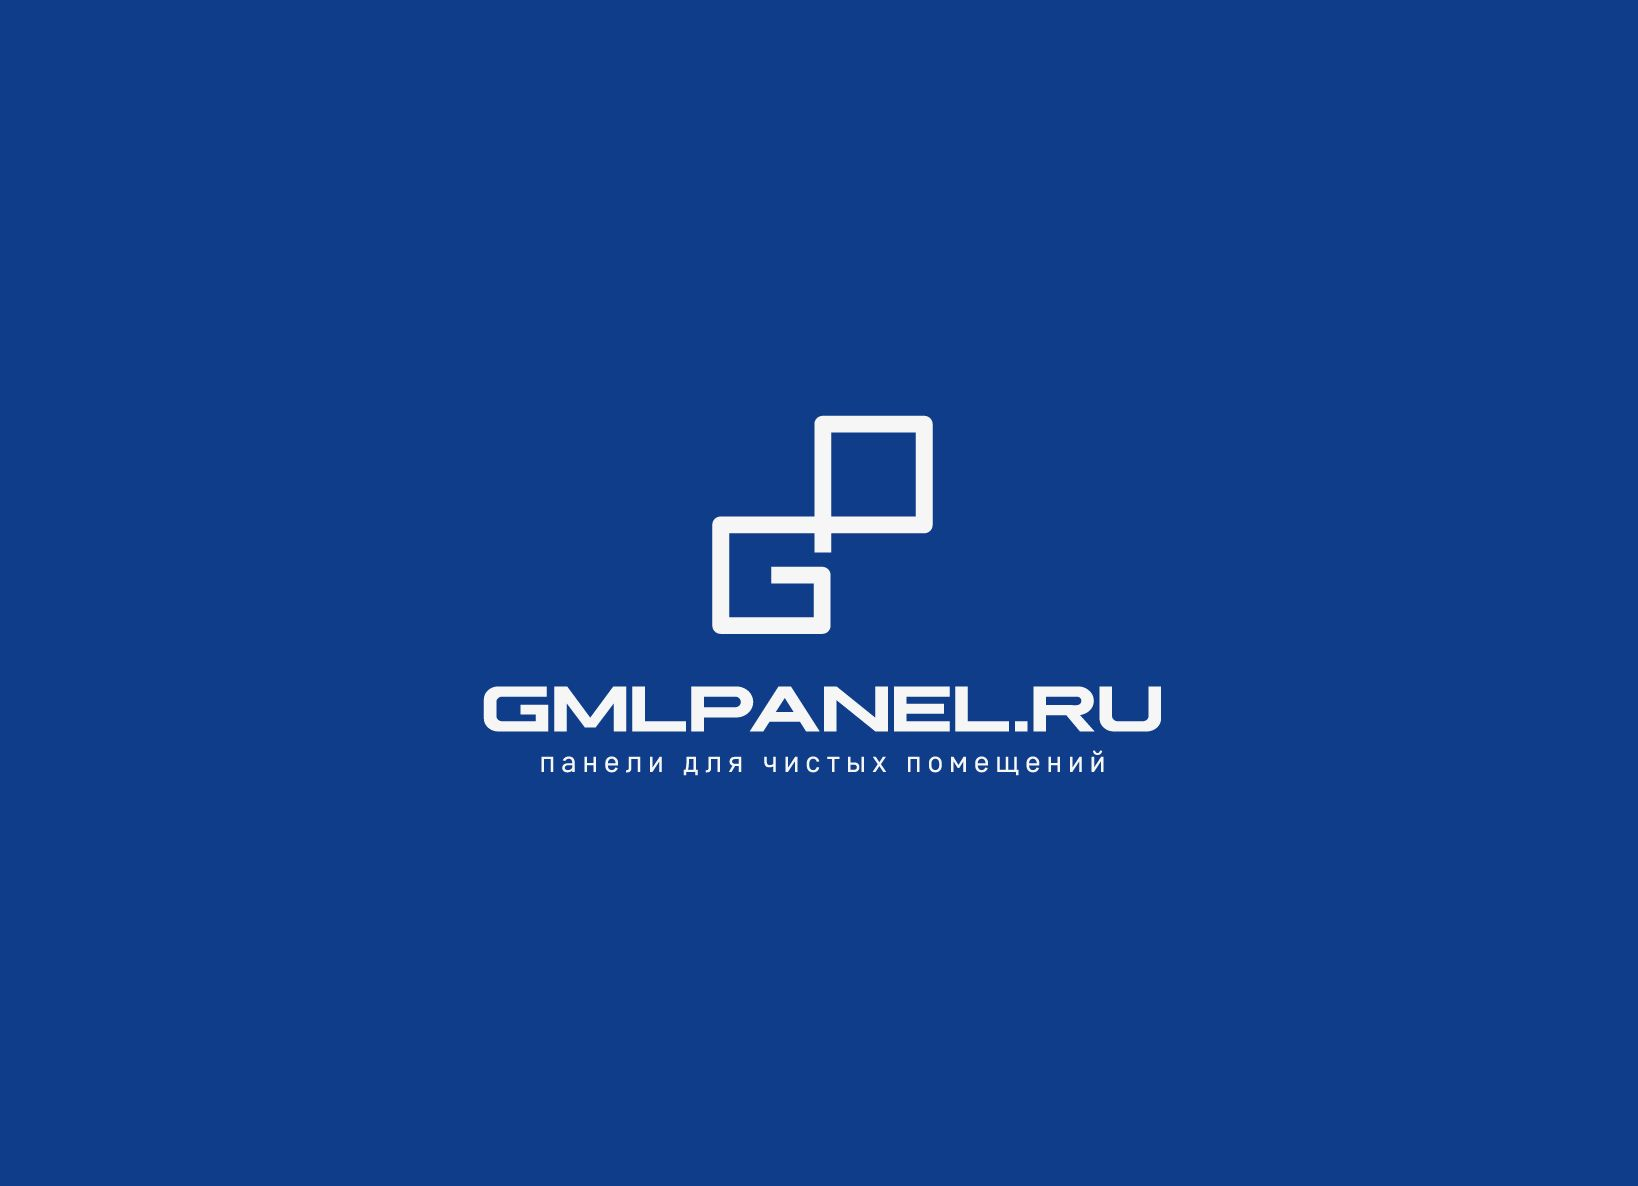 Логотип для сайта GMLPANEL.RU - дизайнер U4po4mak